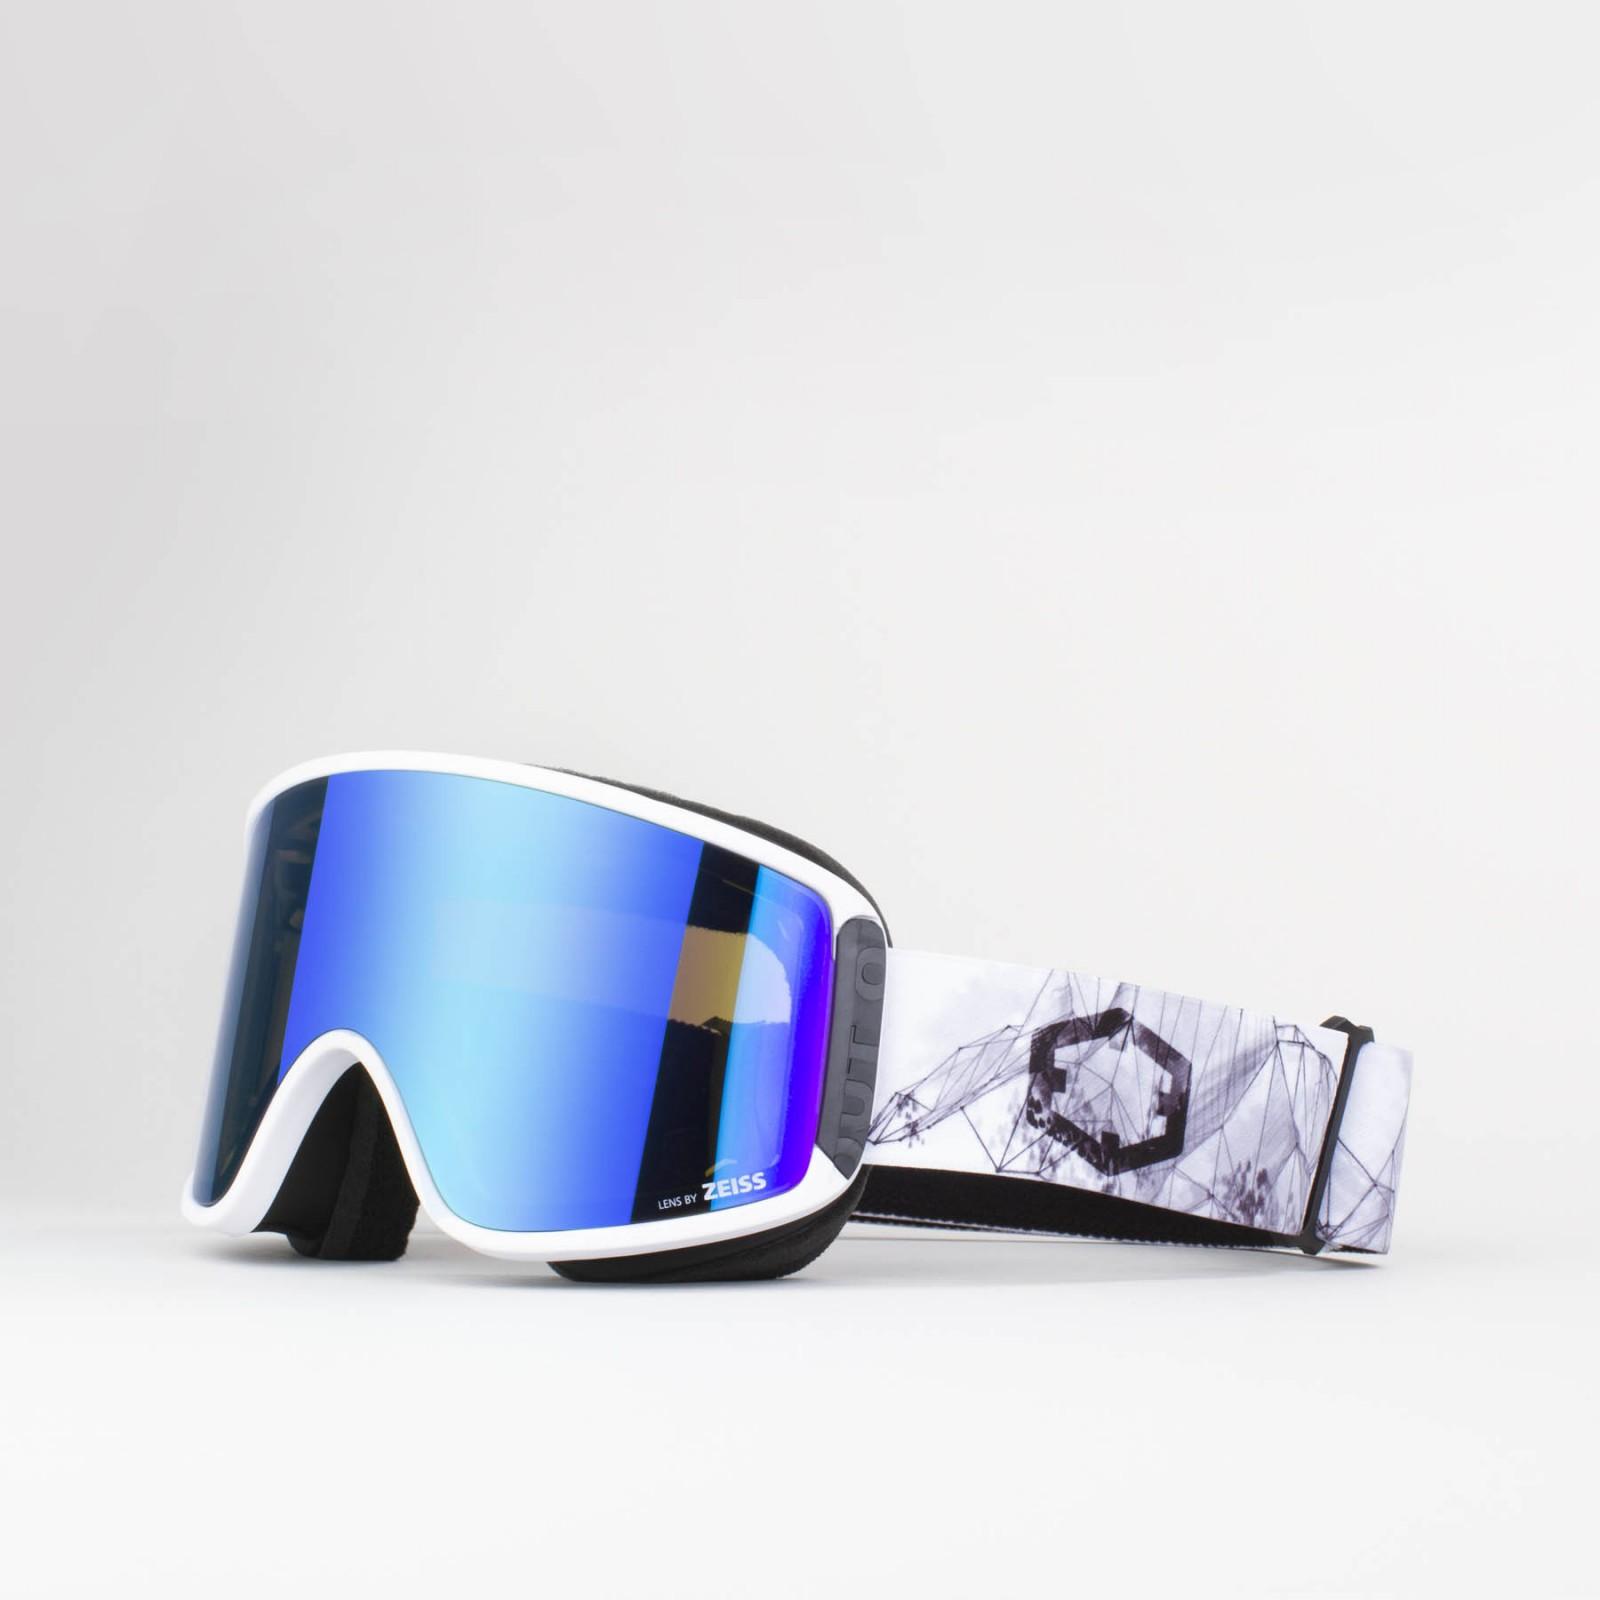 Shift Homespot Blue MCI goggle